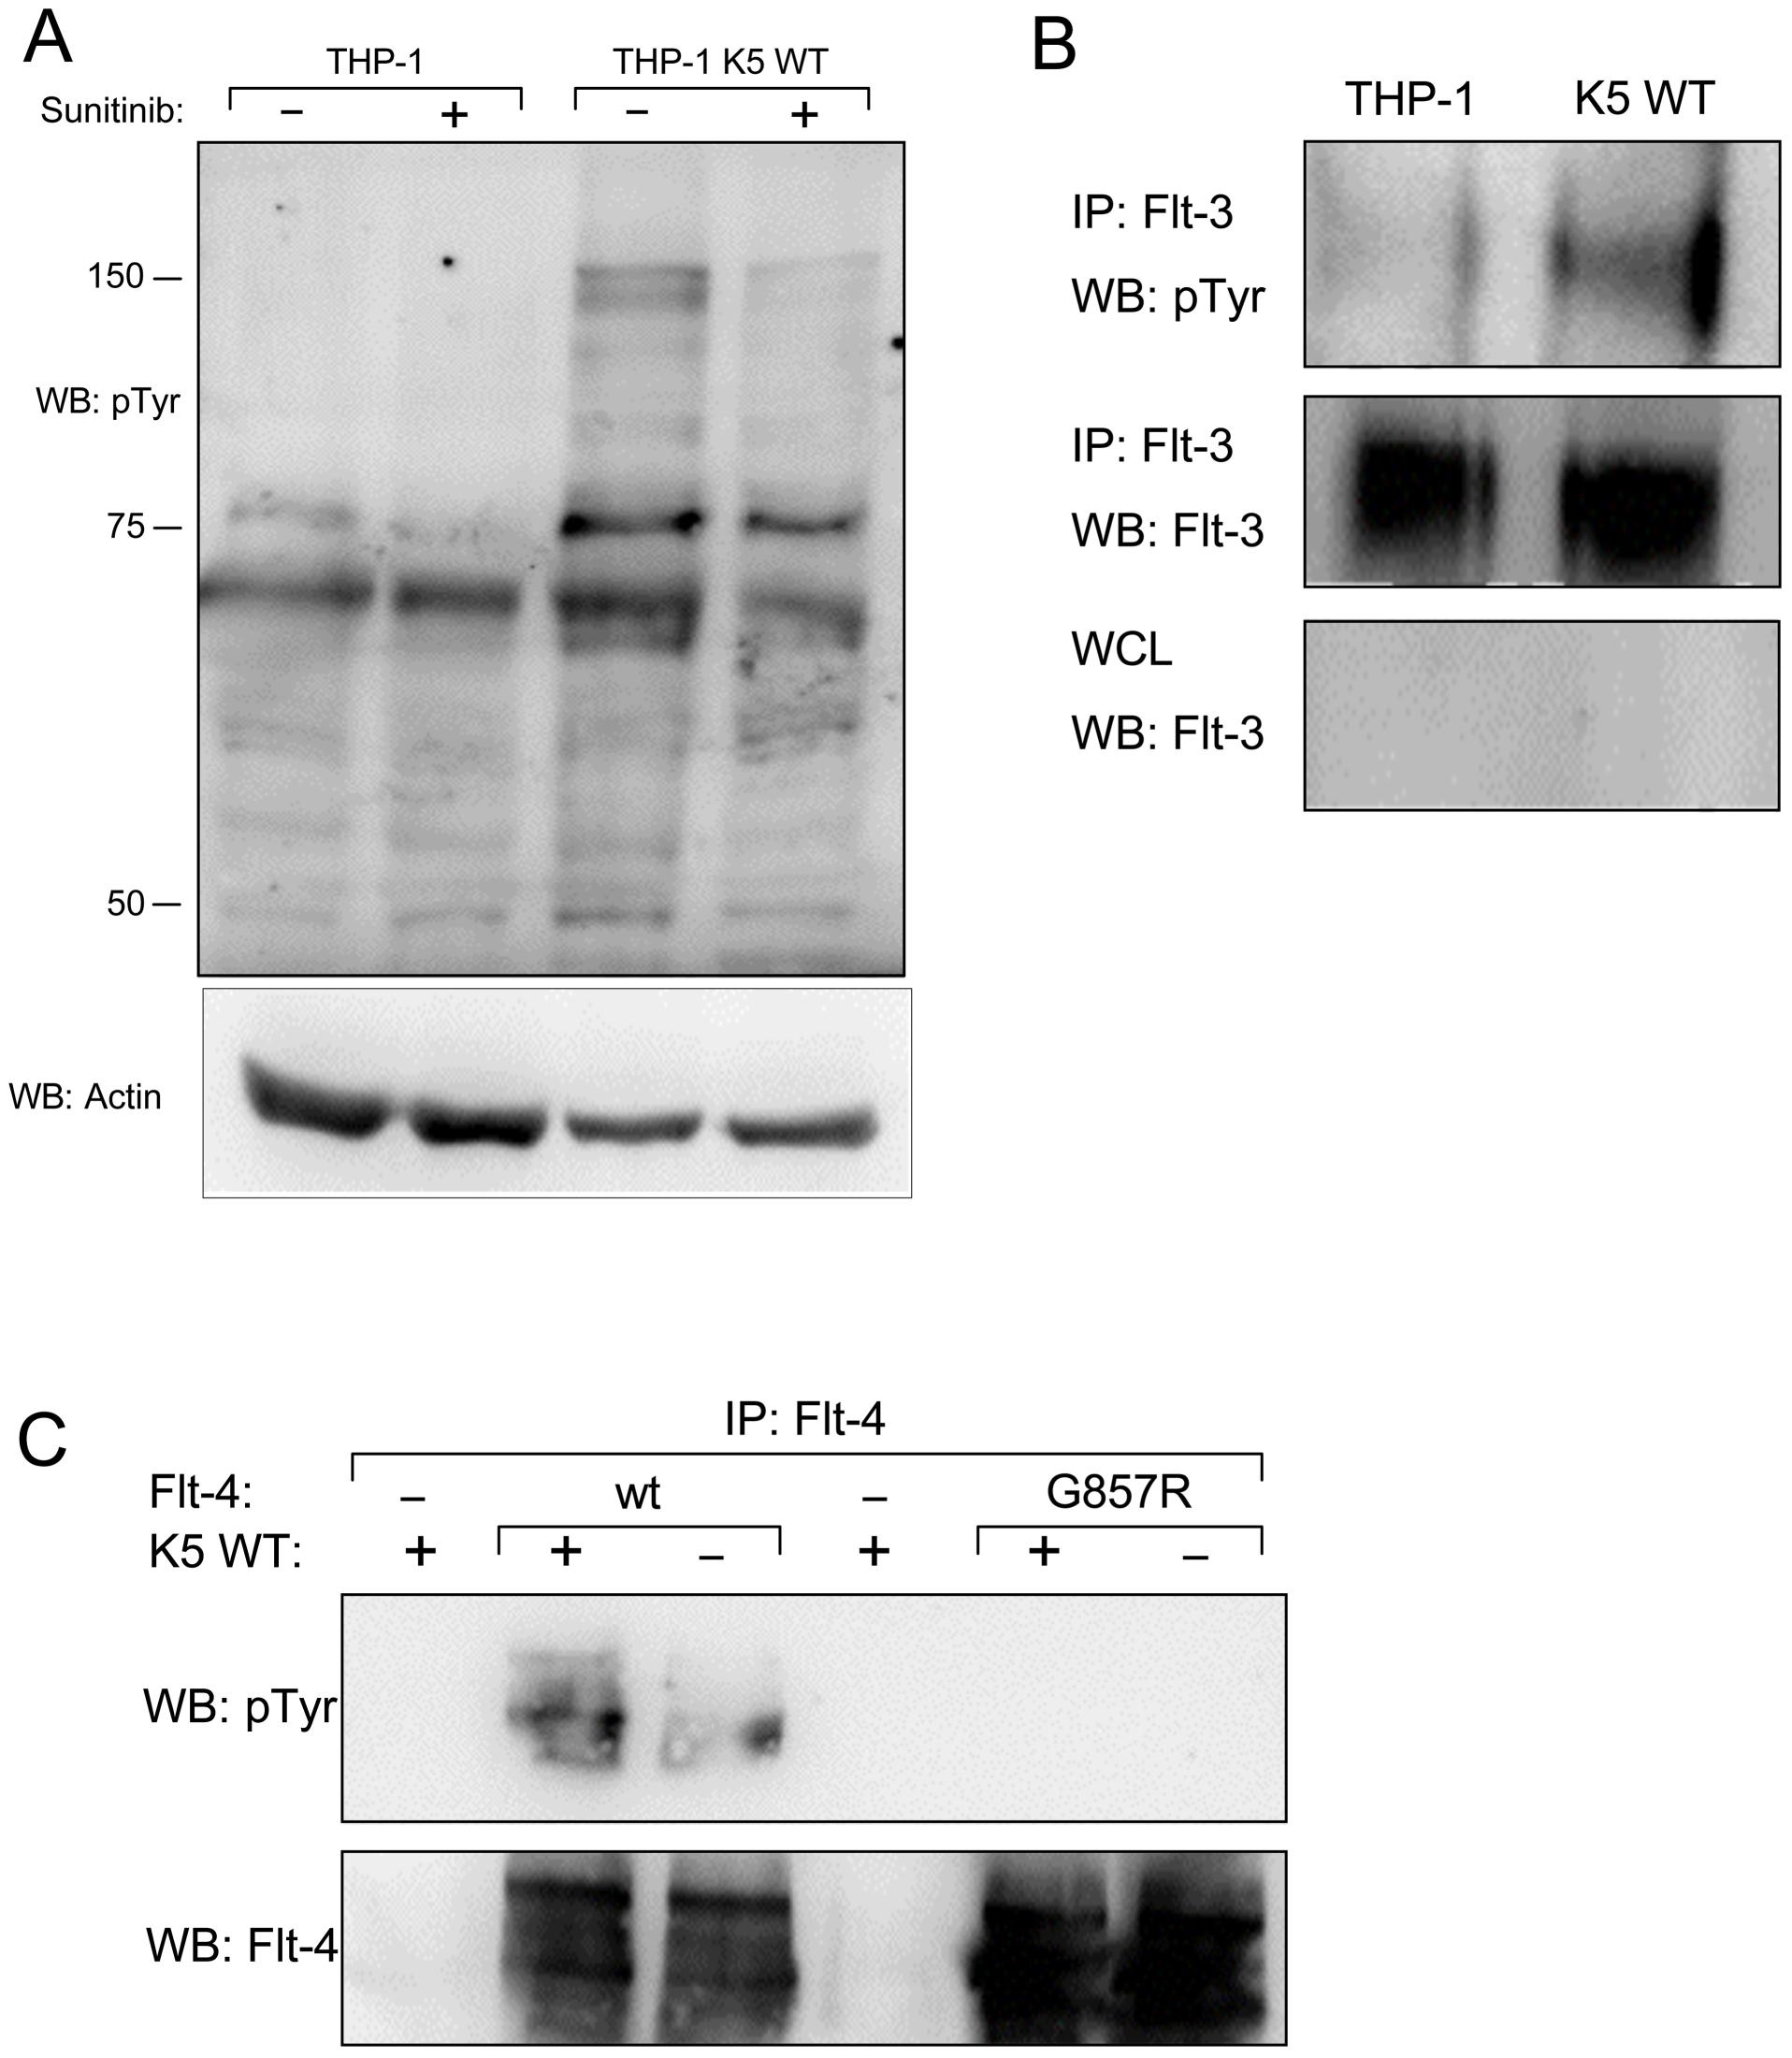 THP-1 cells stably expressing K5 WT have sunitinib-sensitive increased RTK phosphorylation.